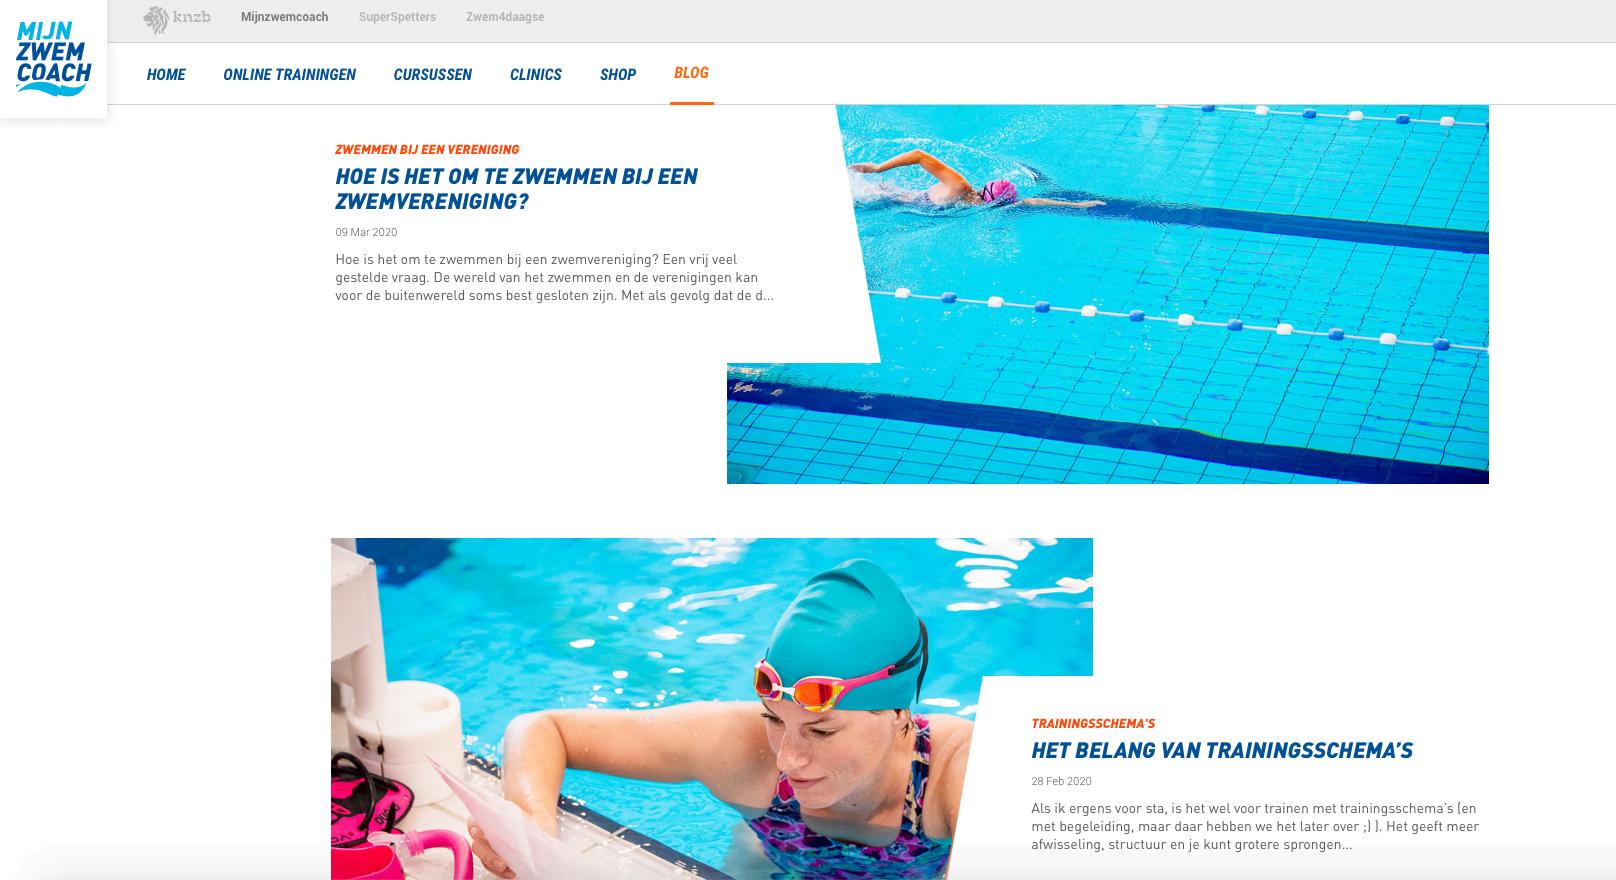 Blogs mijnzwemcoach